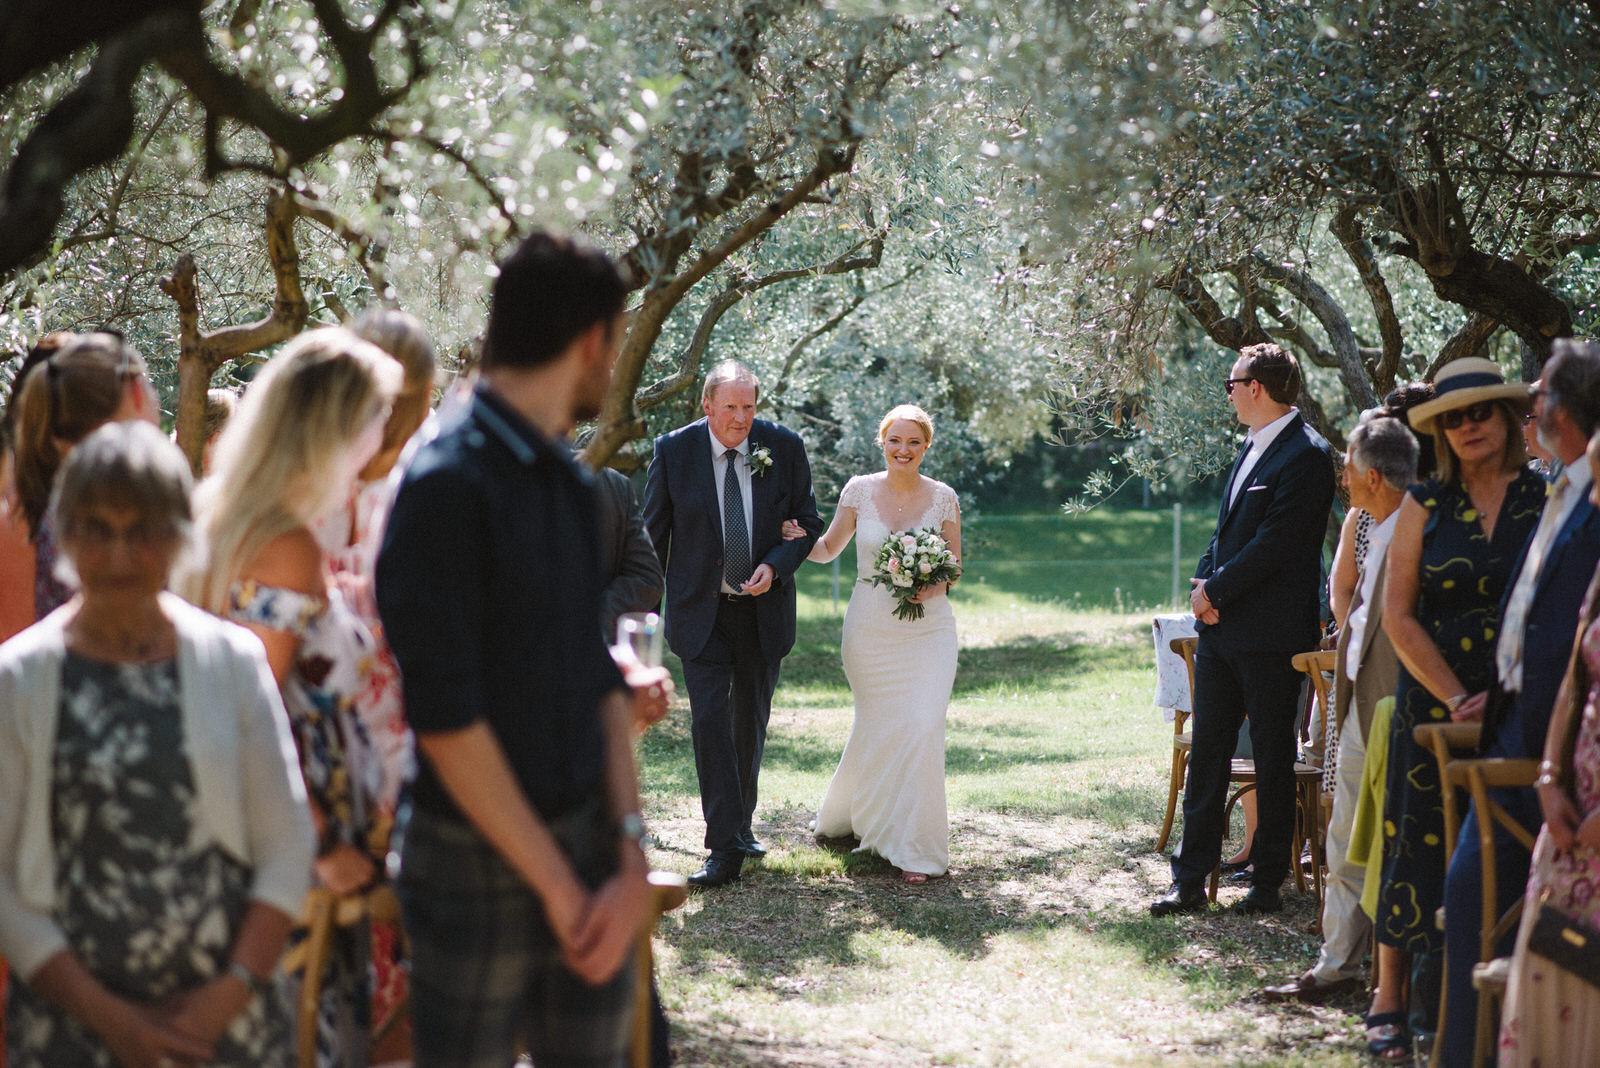 012-LOURMARIN-WEDDING-PHOTOGRAPHER-PROVENCE-WEDDING-ALTERNATIVE-WEDDING-PHOTOGRAPHY-FRANCE-PROVENCE-GARDEN-WEDDING.JPG